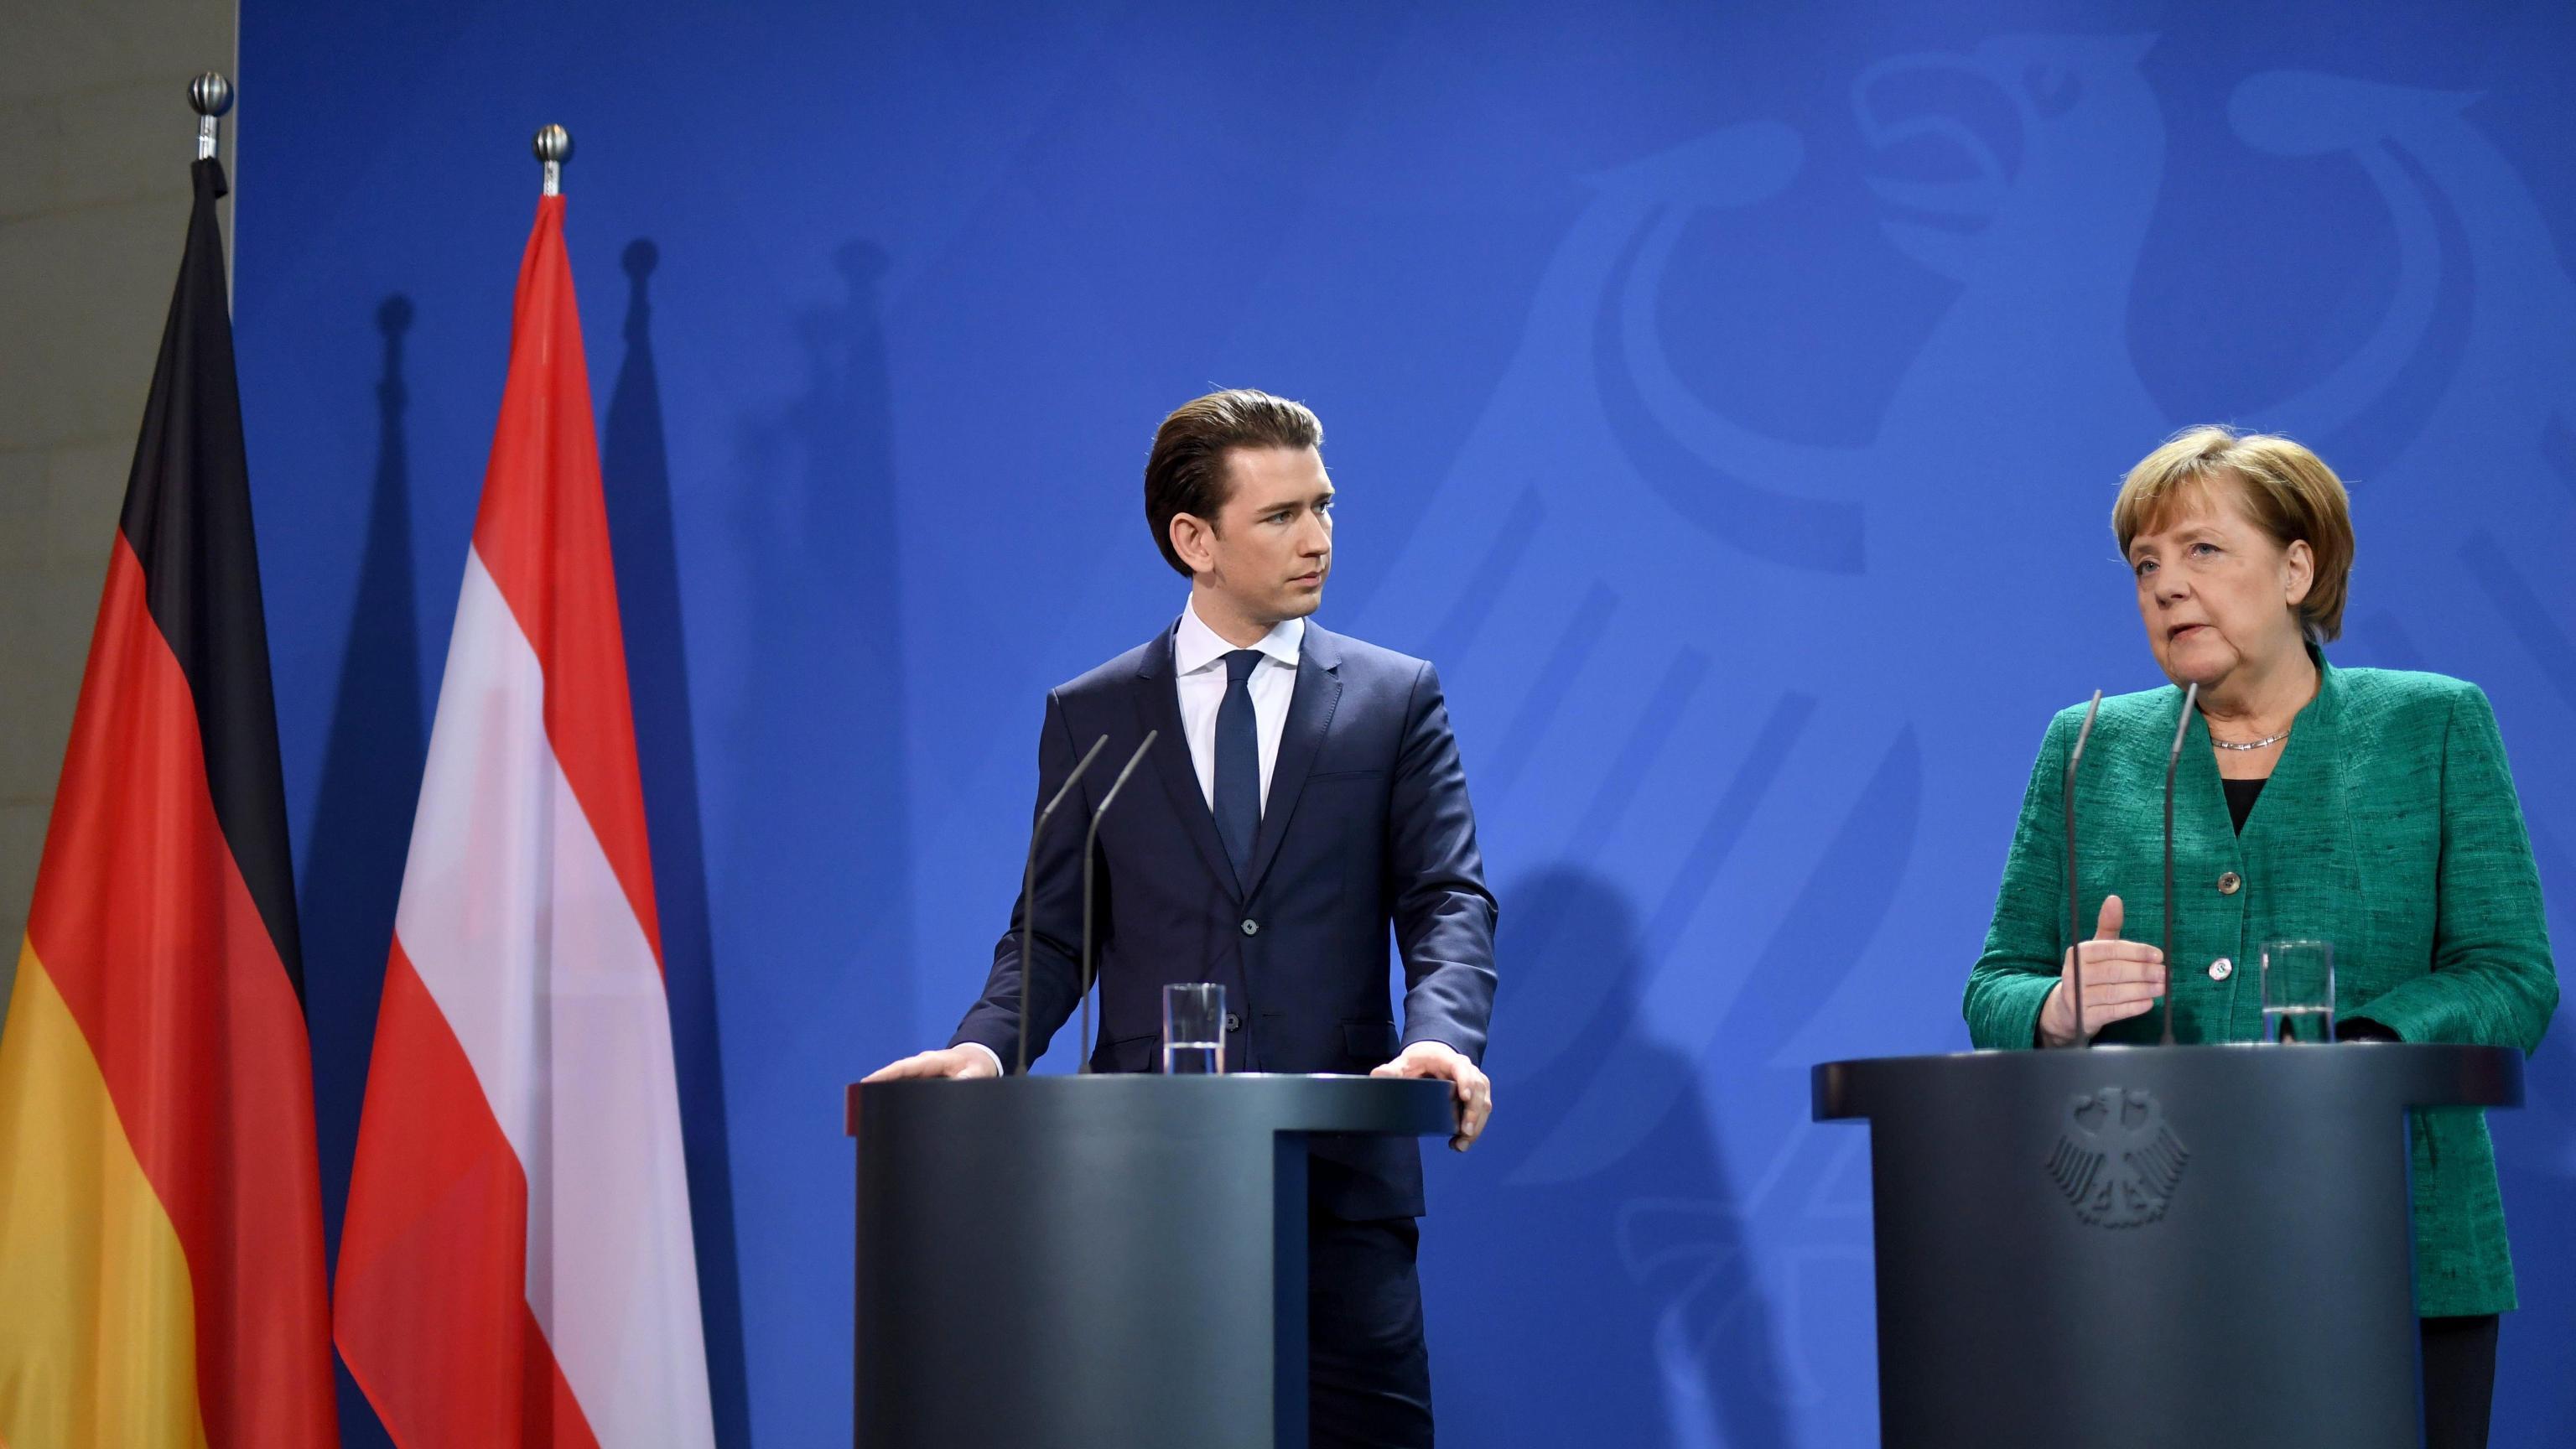 Merkel, misureremo l'Austria dai fatti